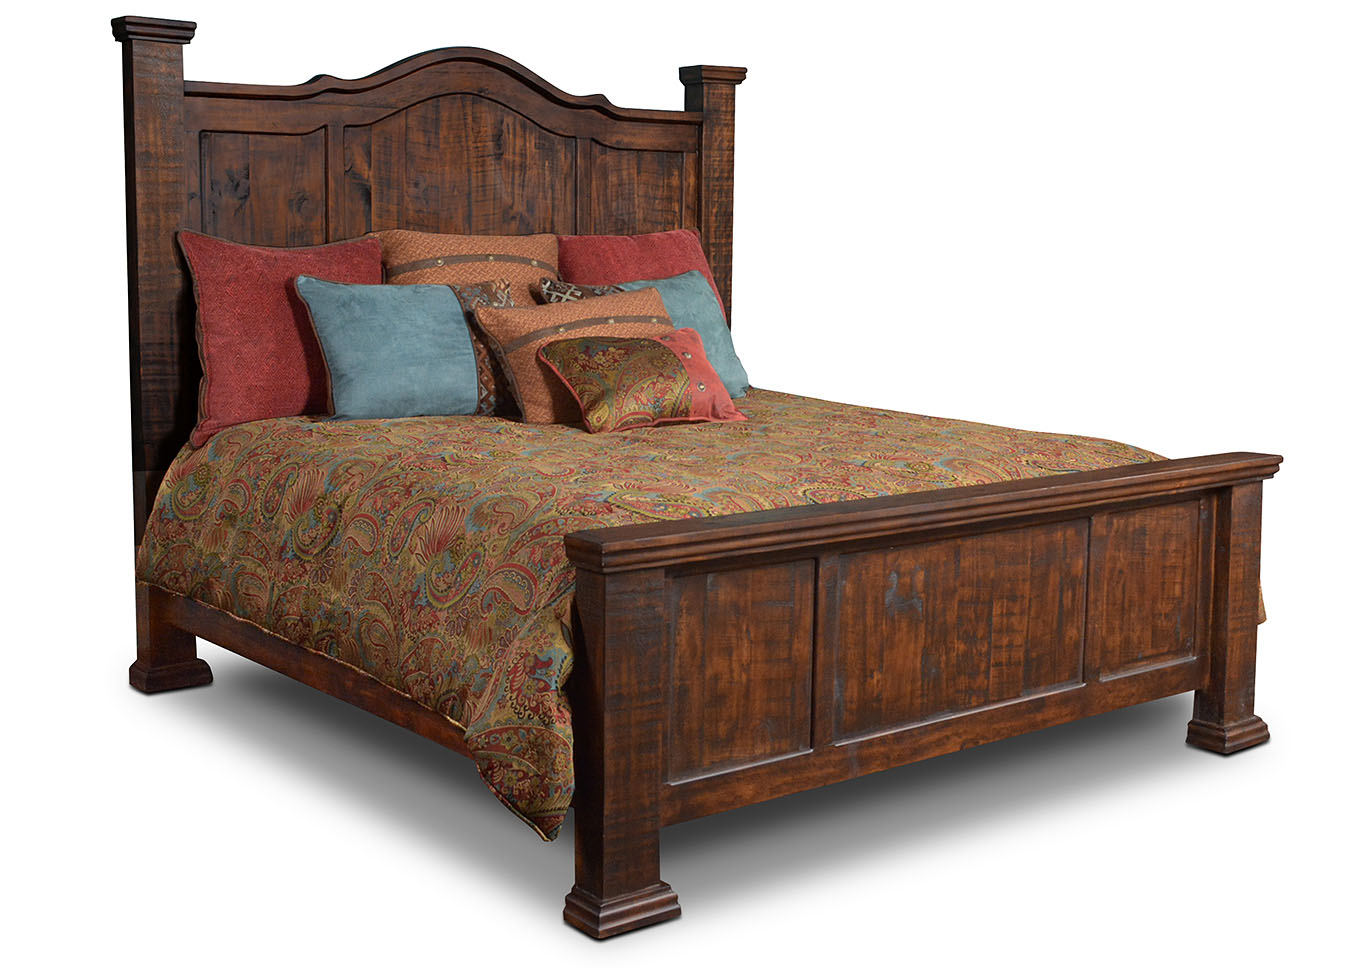 Grand Rustic California King Bed Mattress Furniture For Less